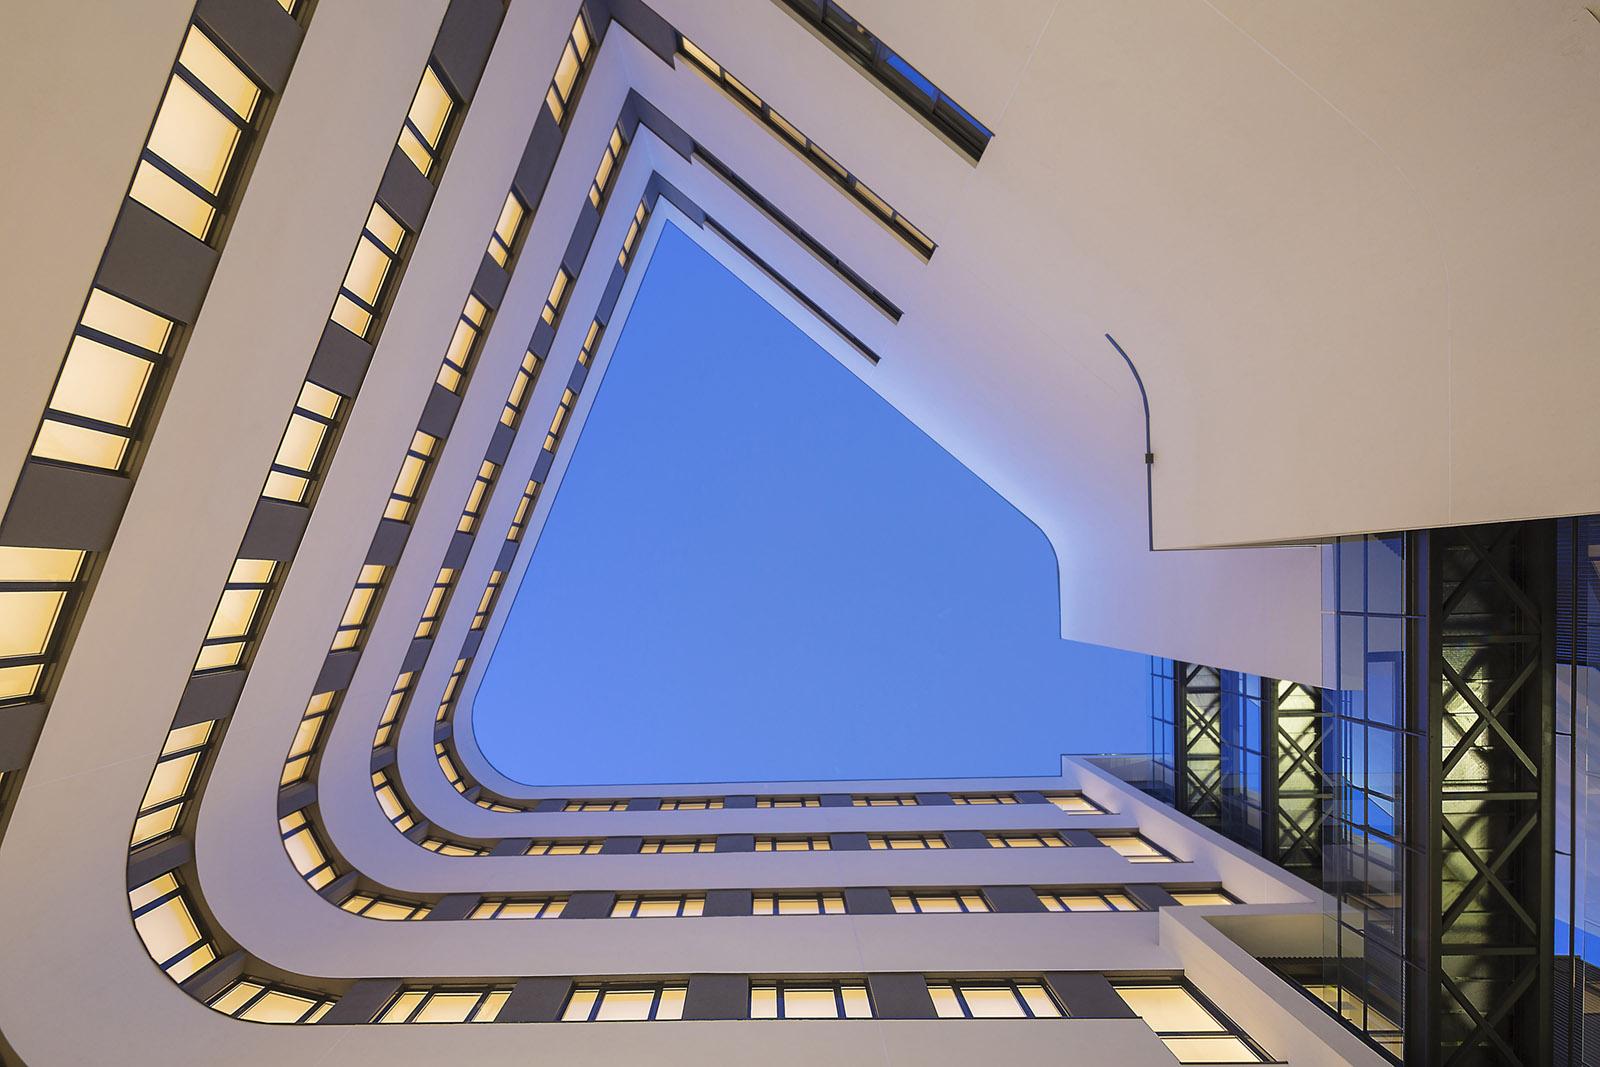 Architectural651-Interior-photographer-Madrid-Spain-.jpg